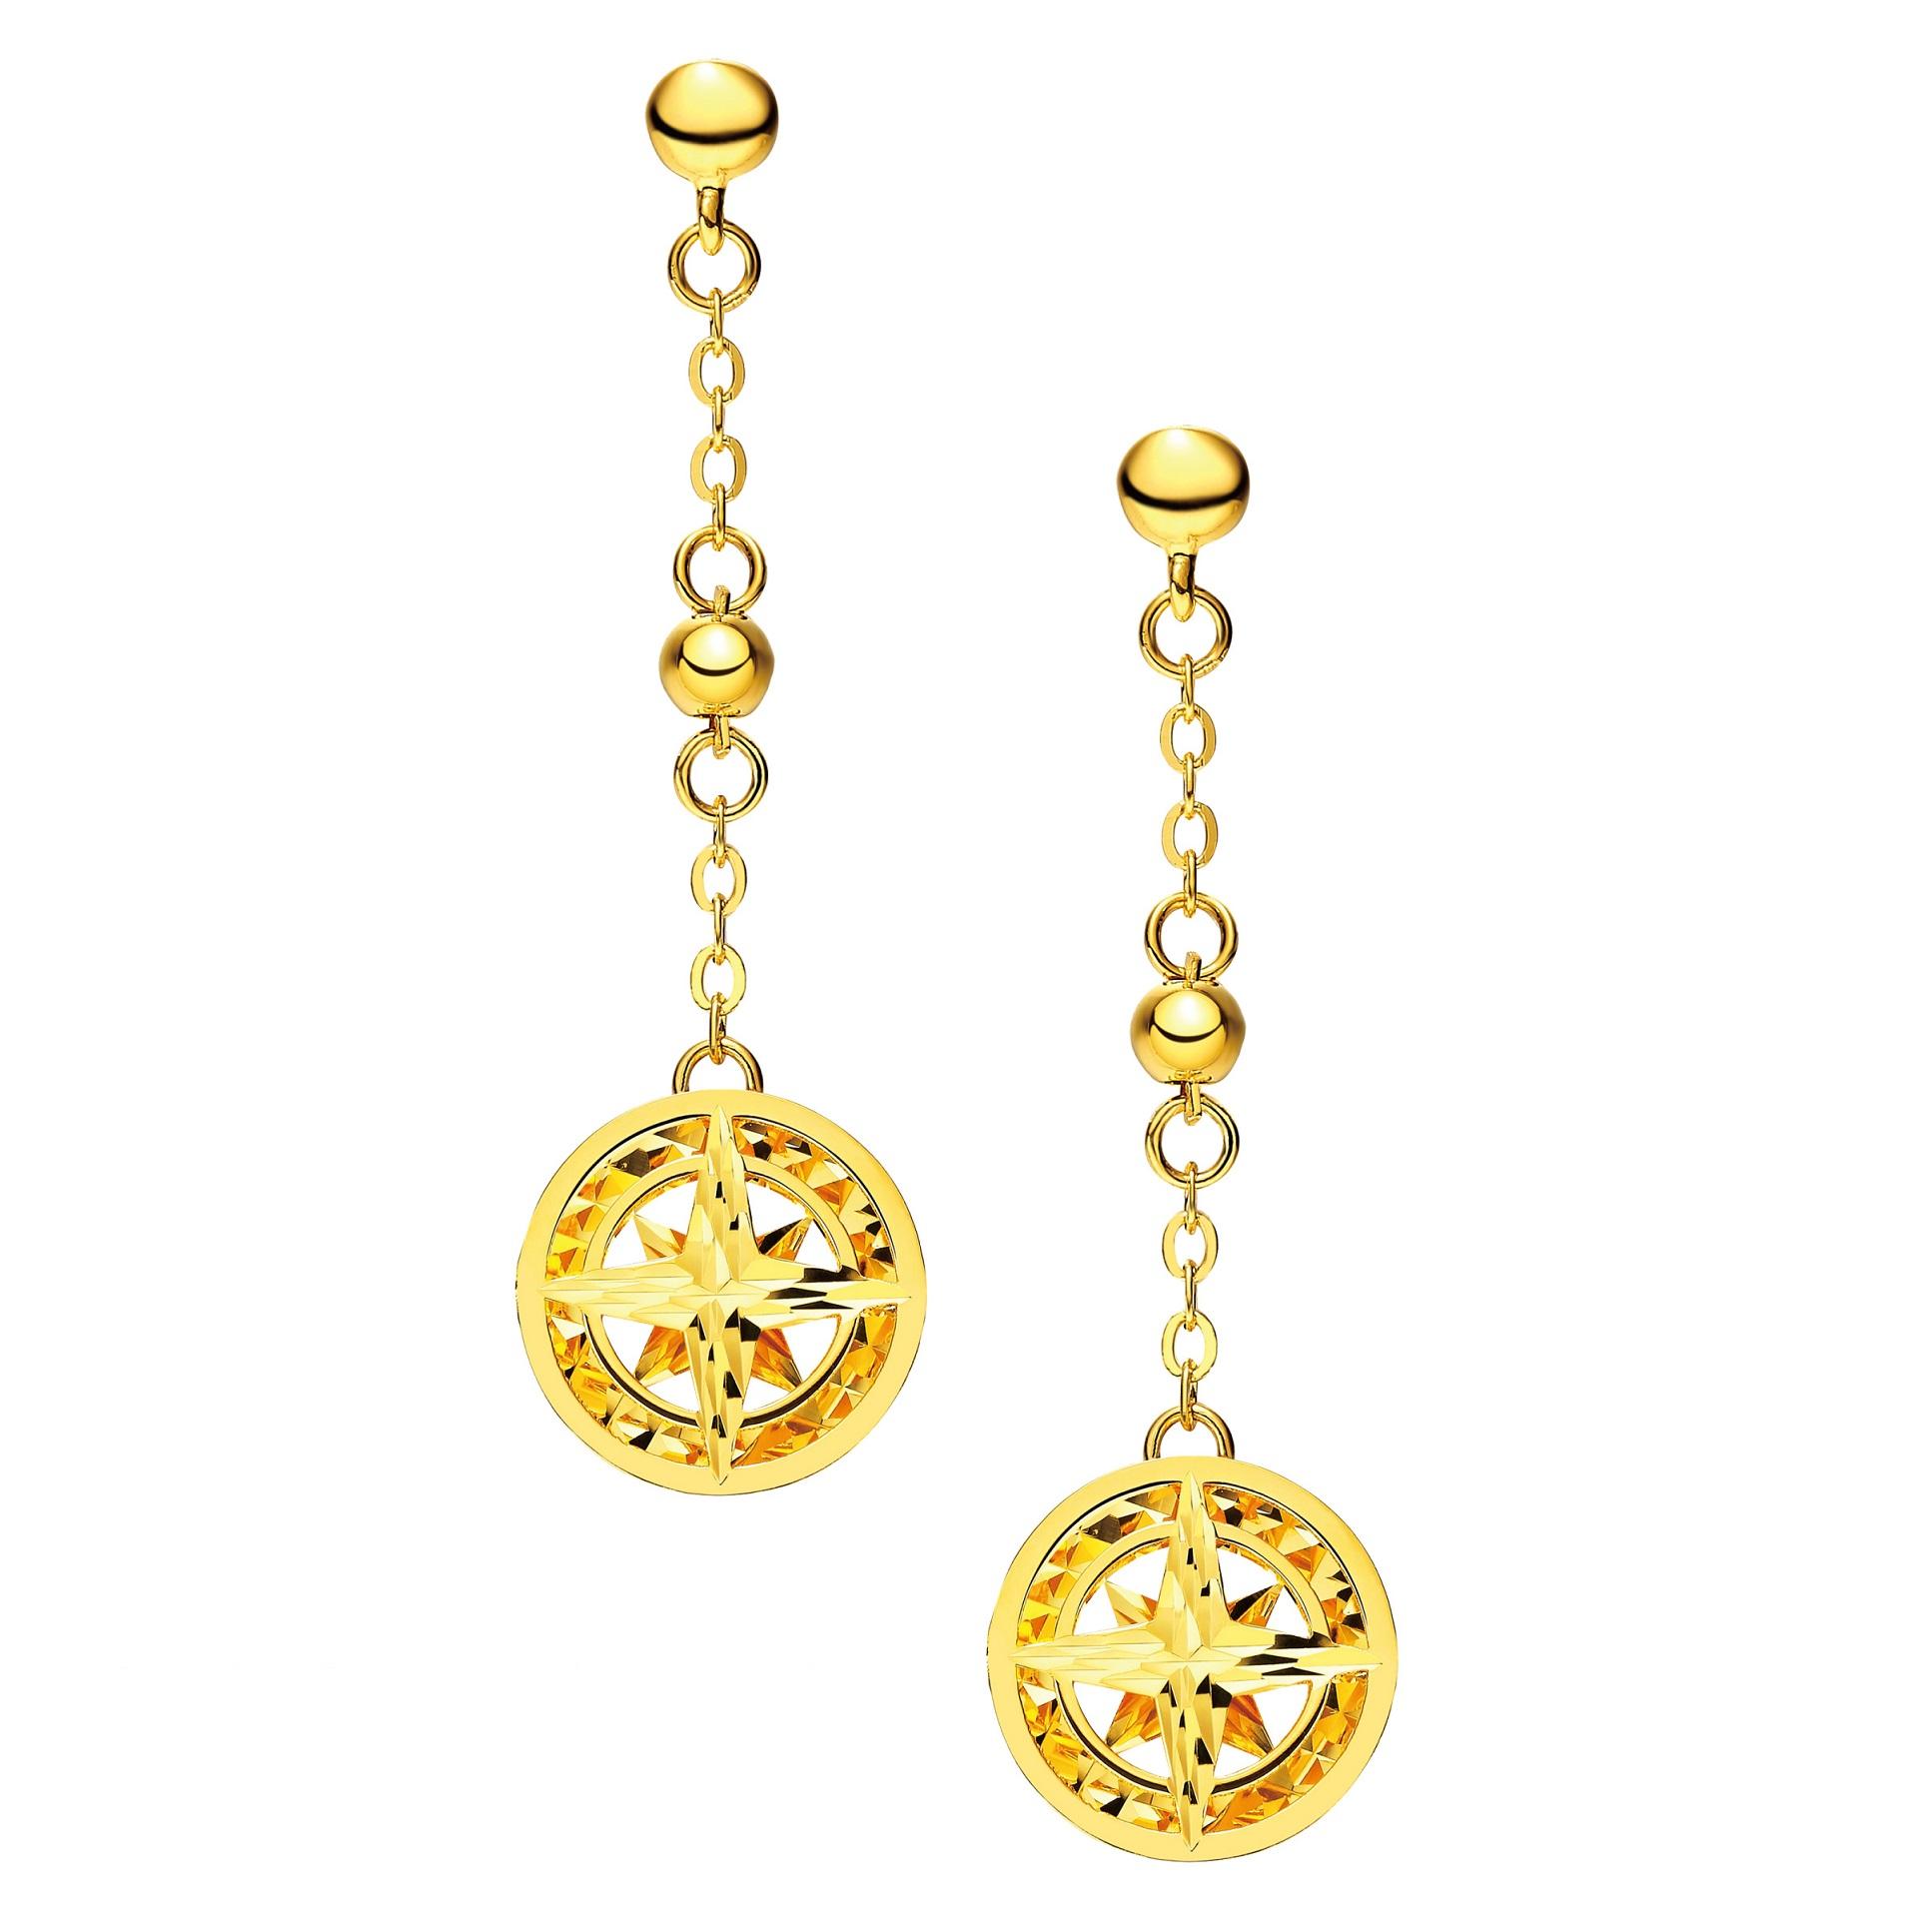 Goldstyle Sparkling Star Earrings